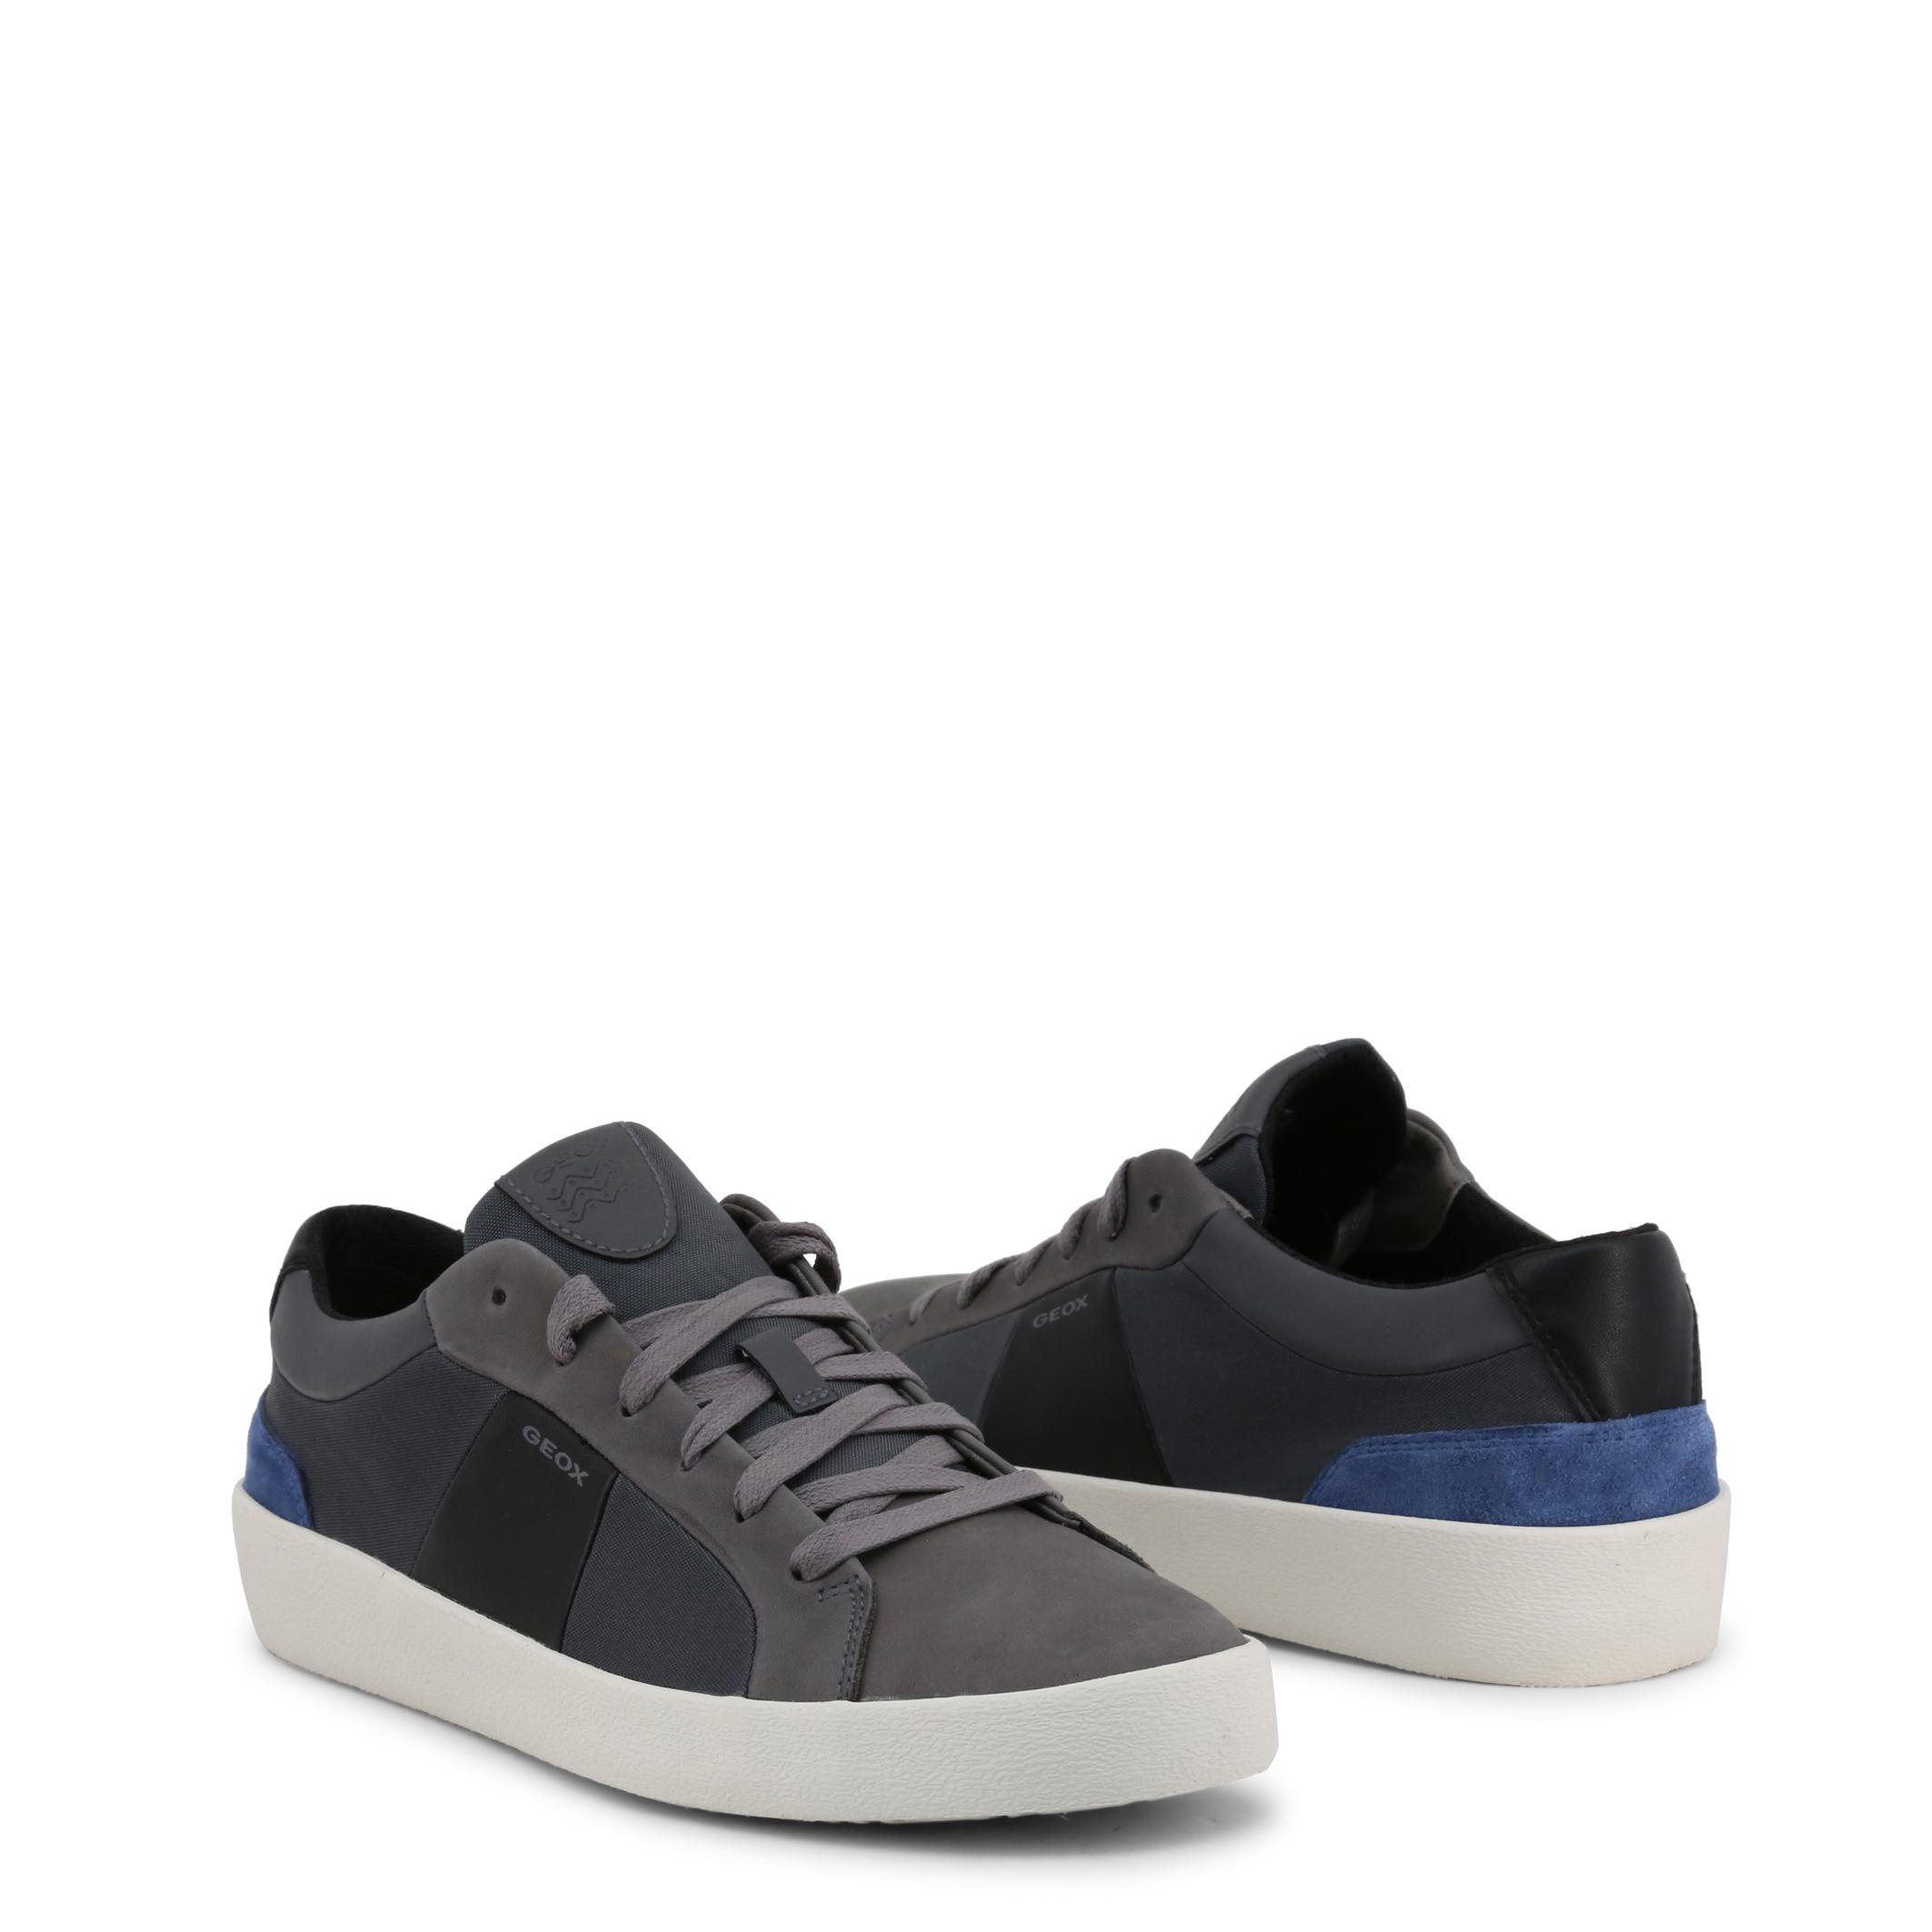 Sneakers-Geox-WARLEY-Uomo-Grigio-100592 miniatura 2